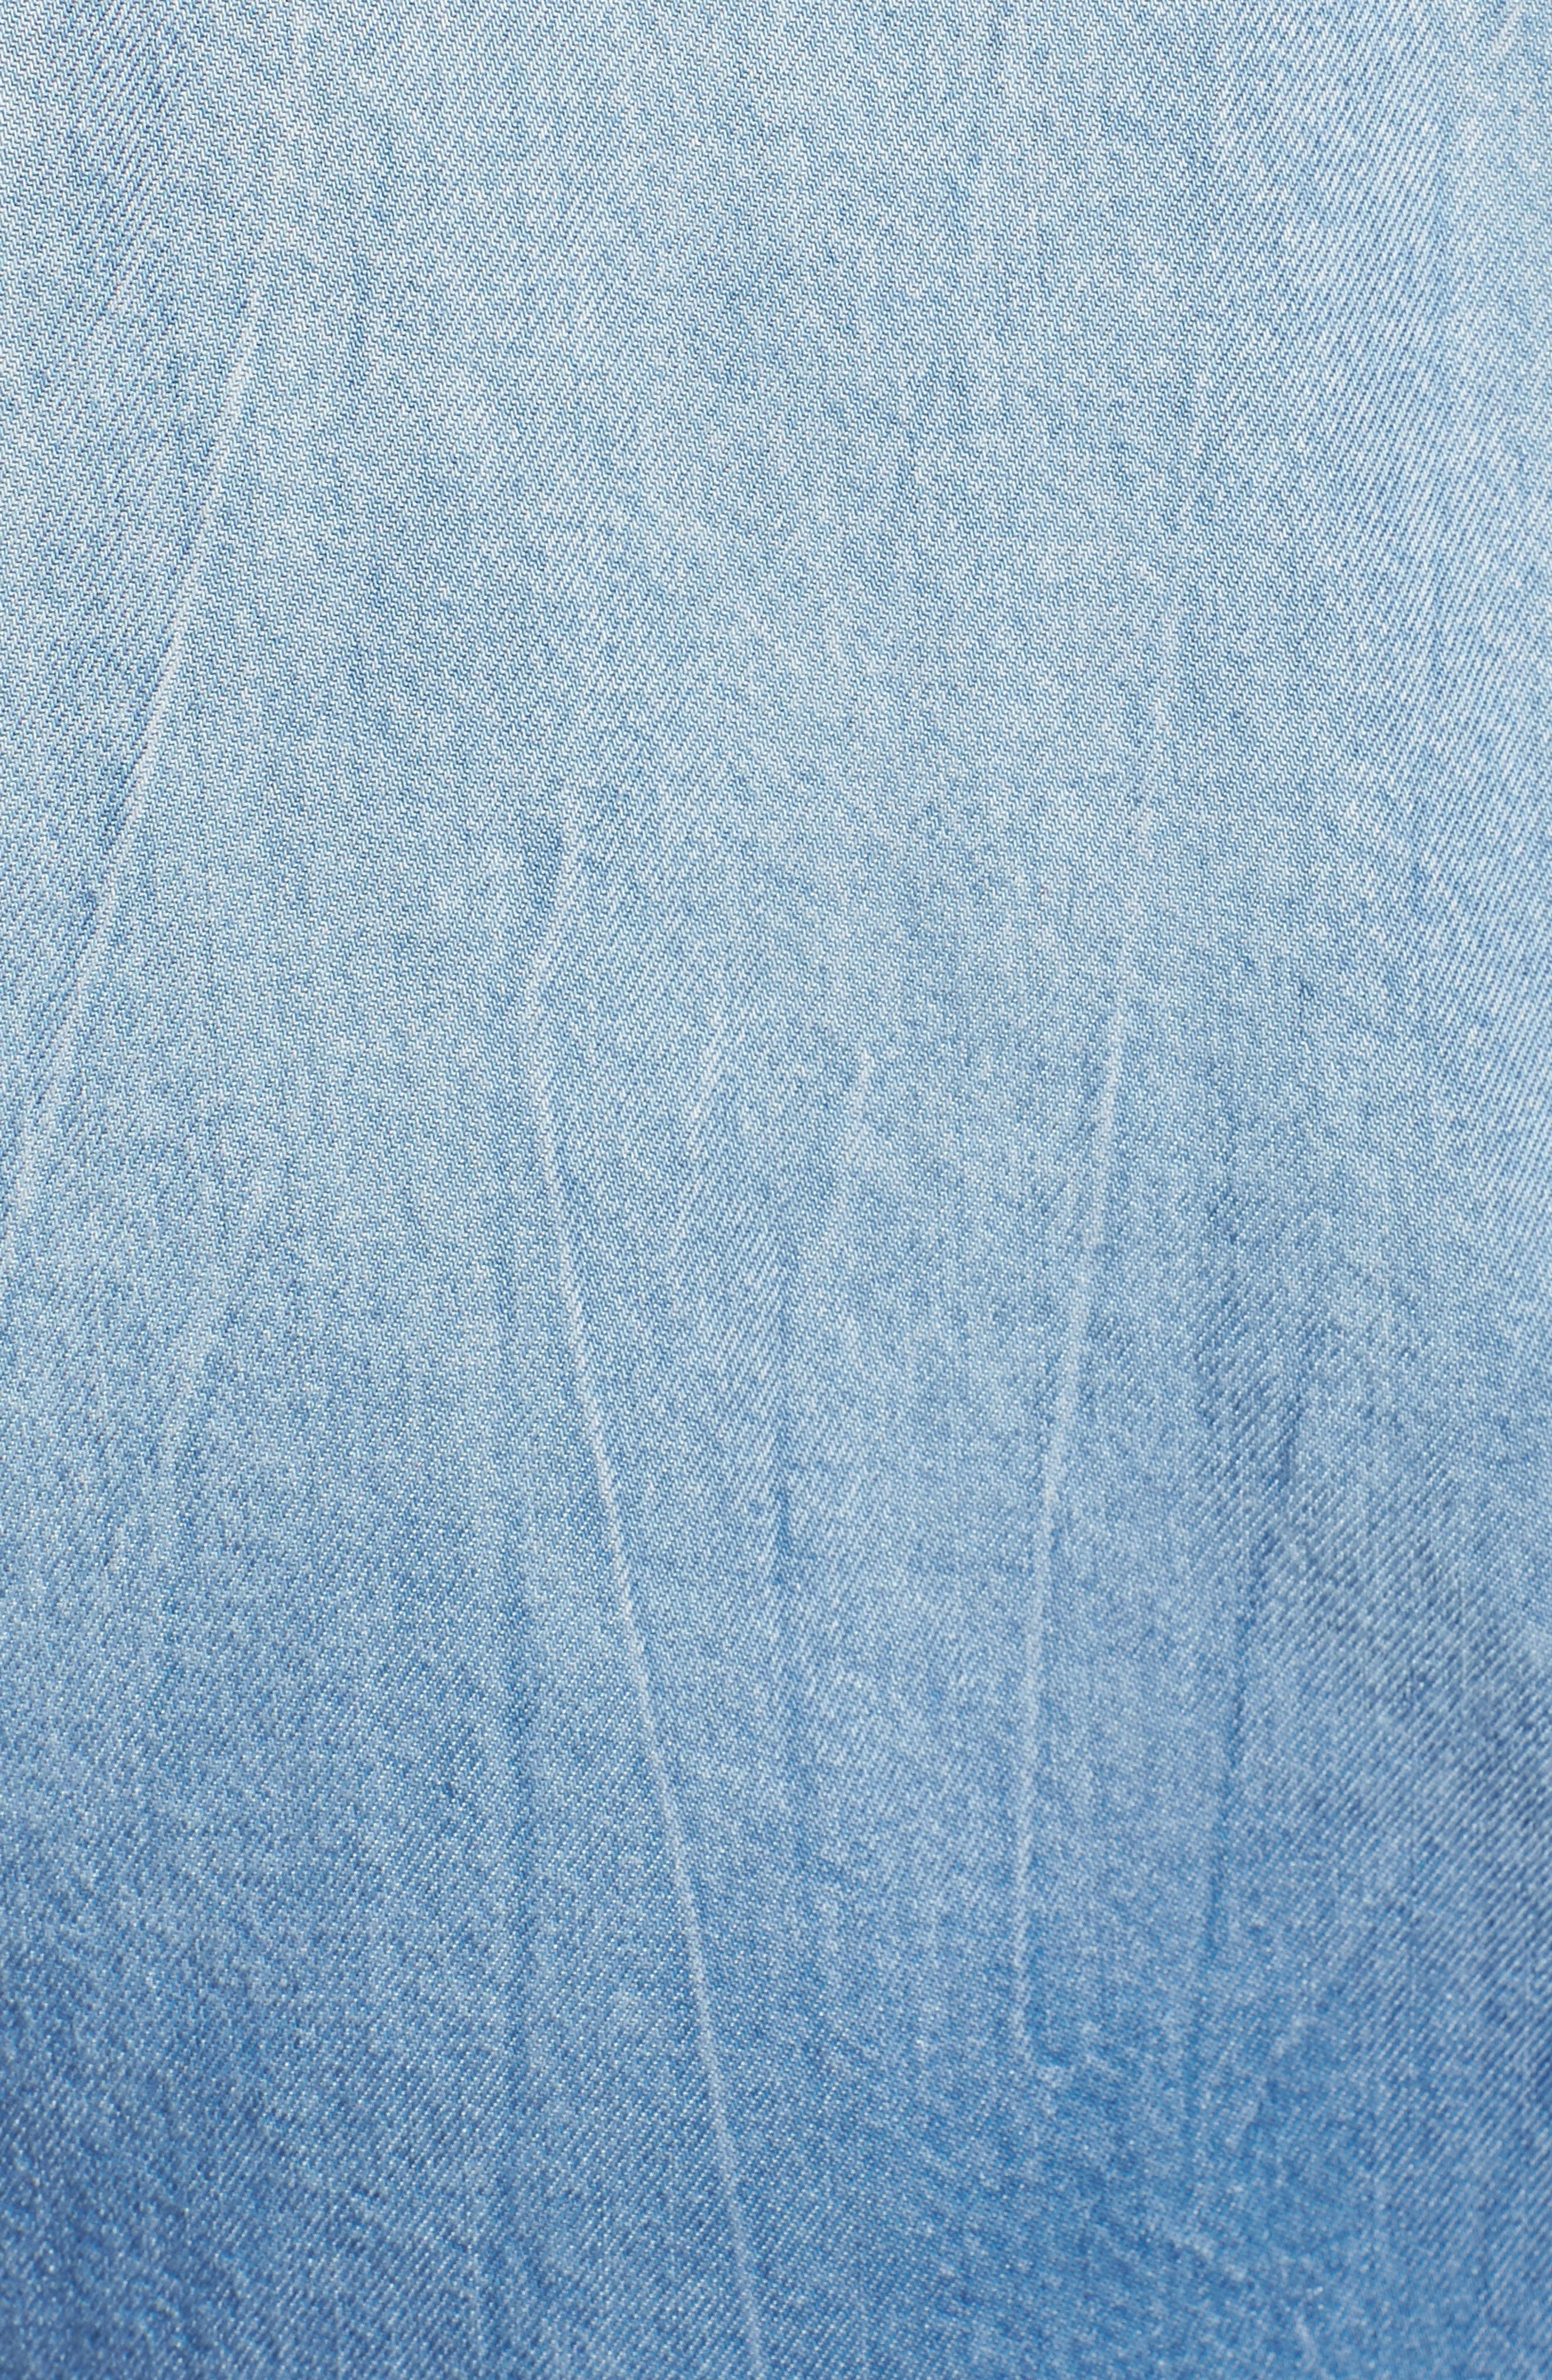 x Margherita Roma Indigo Shirt,                             Alternate thumbnail 5, color,                             Cielo Wash